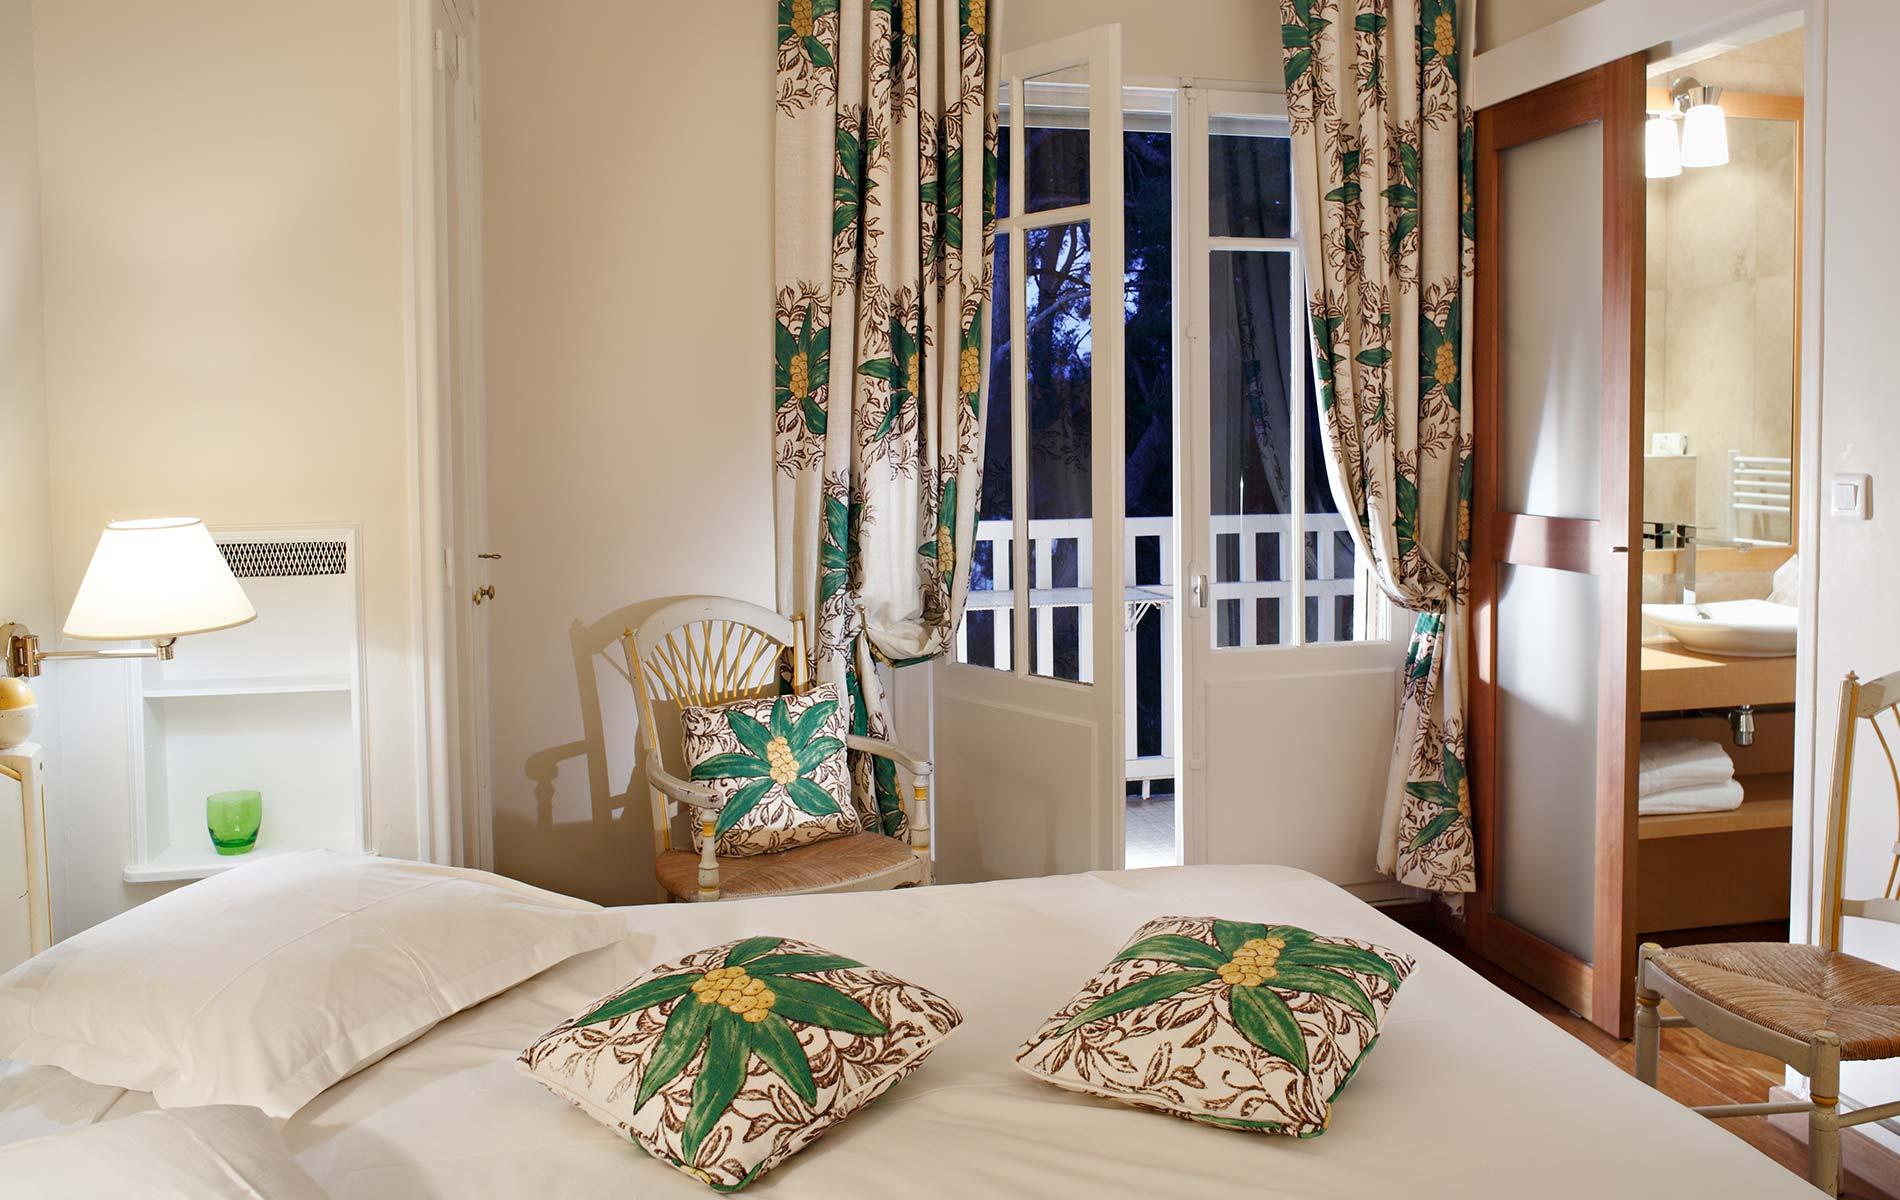 chambre standard grand hotel les lecques site officiel hotel cassis. Black Bedroom Furniture Sets. Home Design Ideas